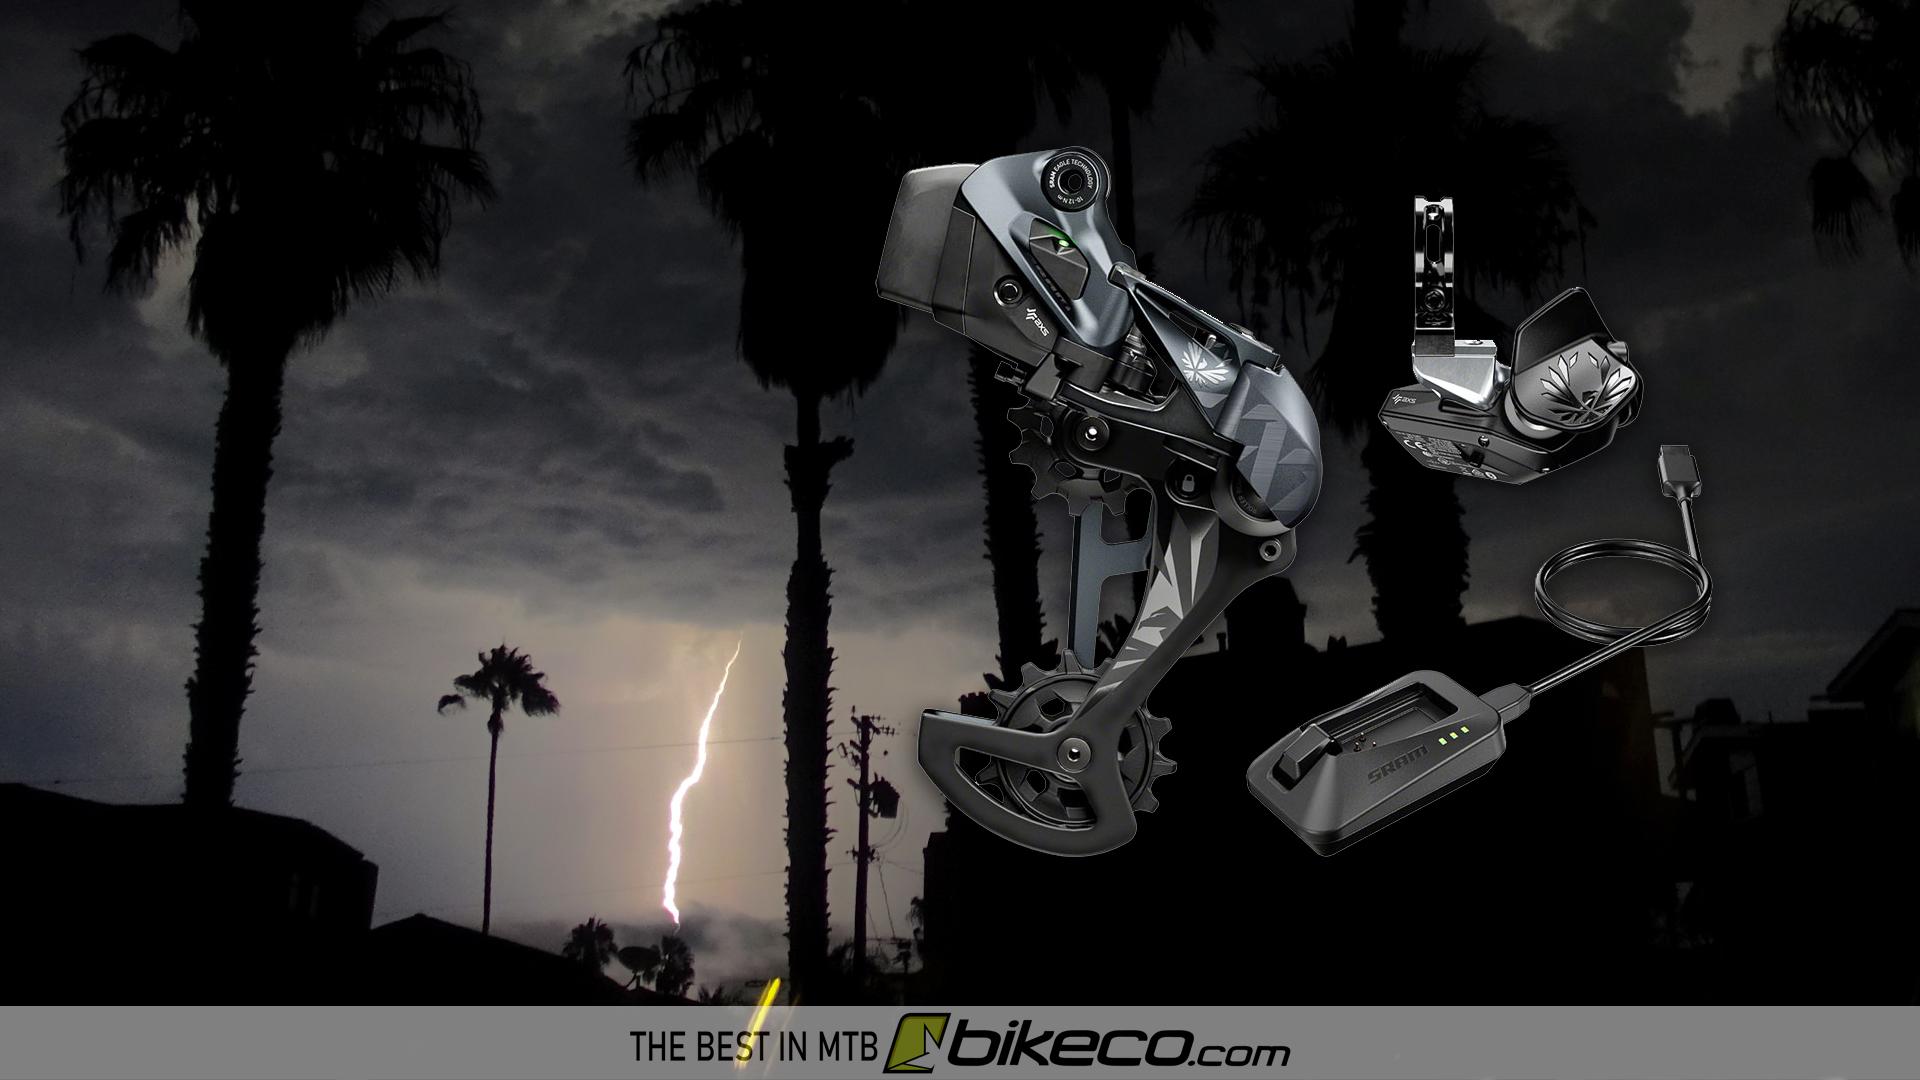 SRAM AXS Kit image over Lightning Image